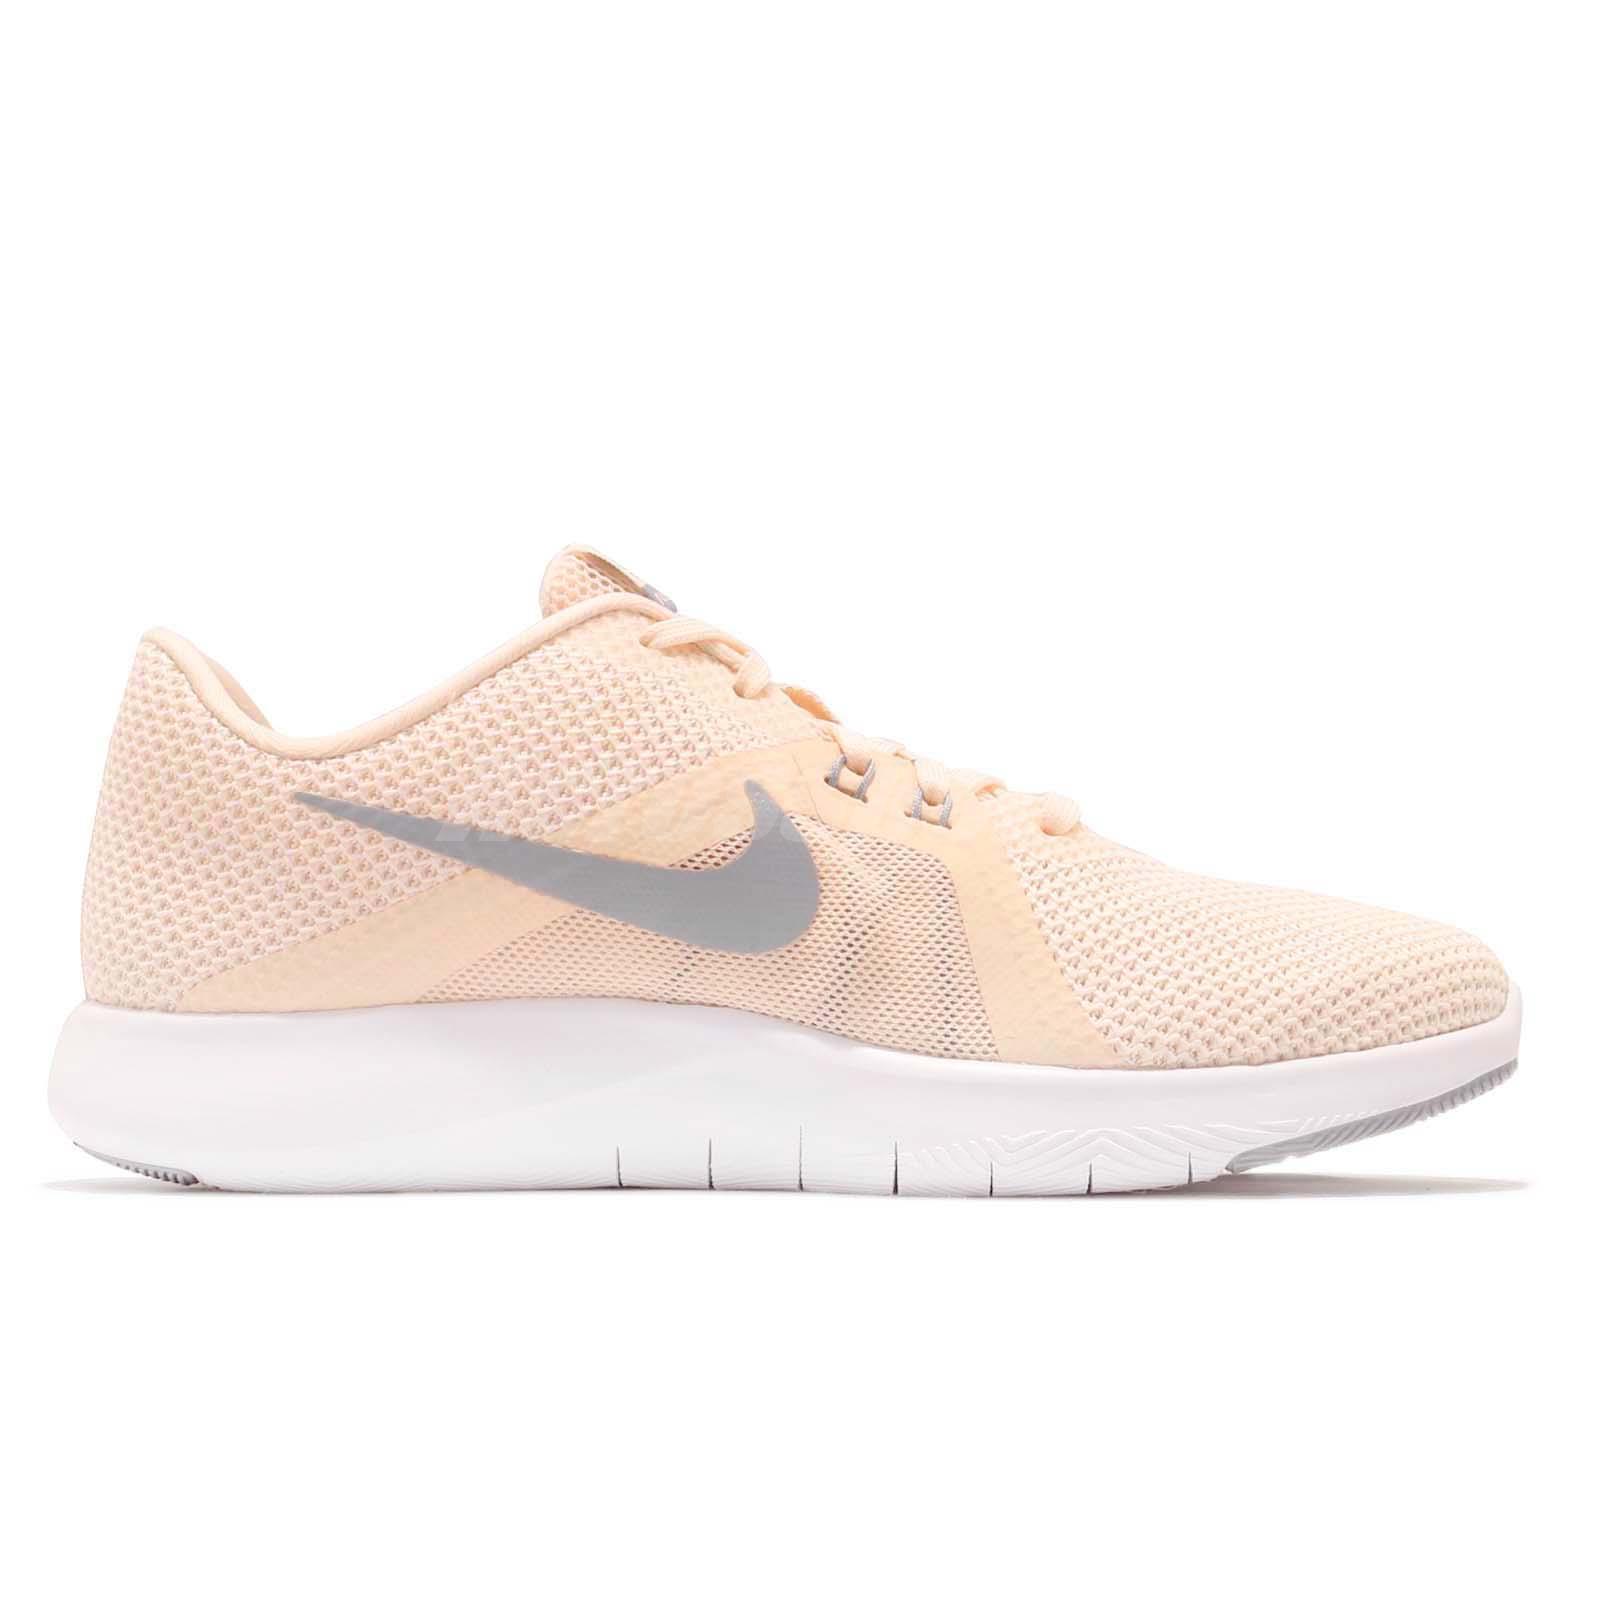 Nike Wmns Flex Trainer 8 VIII Guava Ice Grey Women Cross Training ... 98bc67a7498